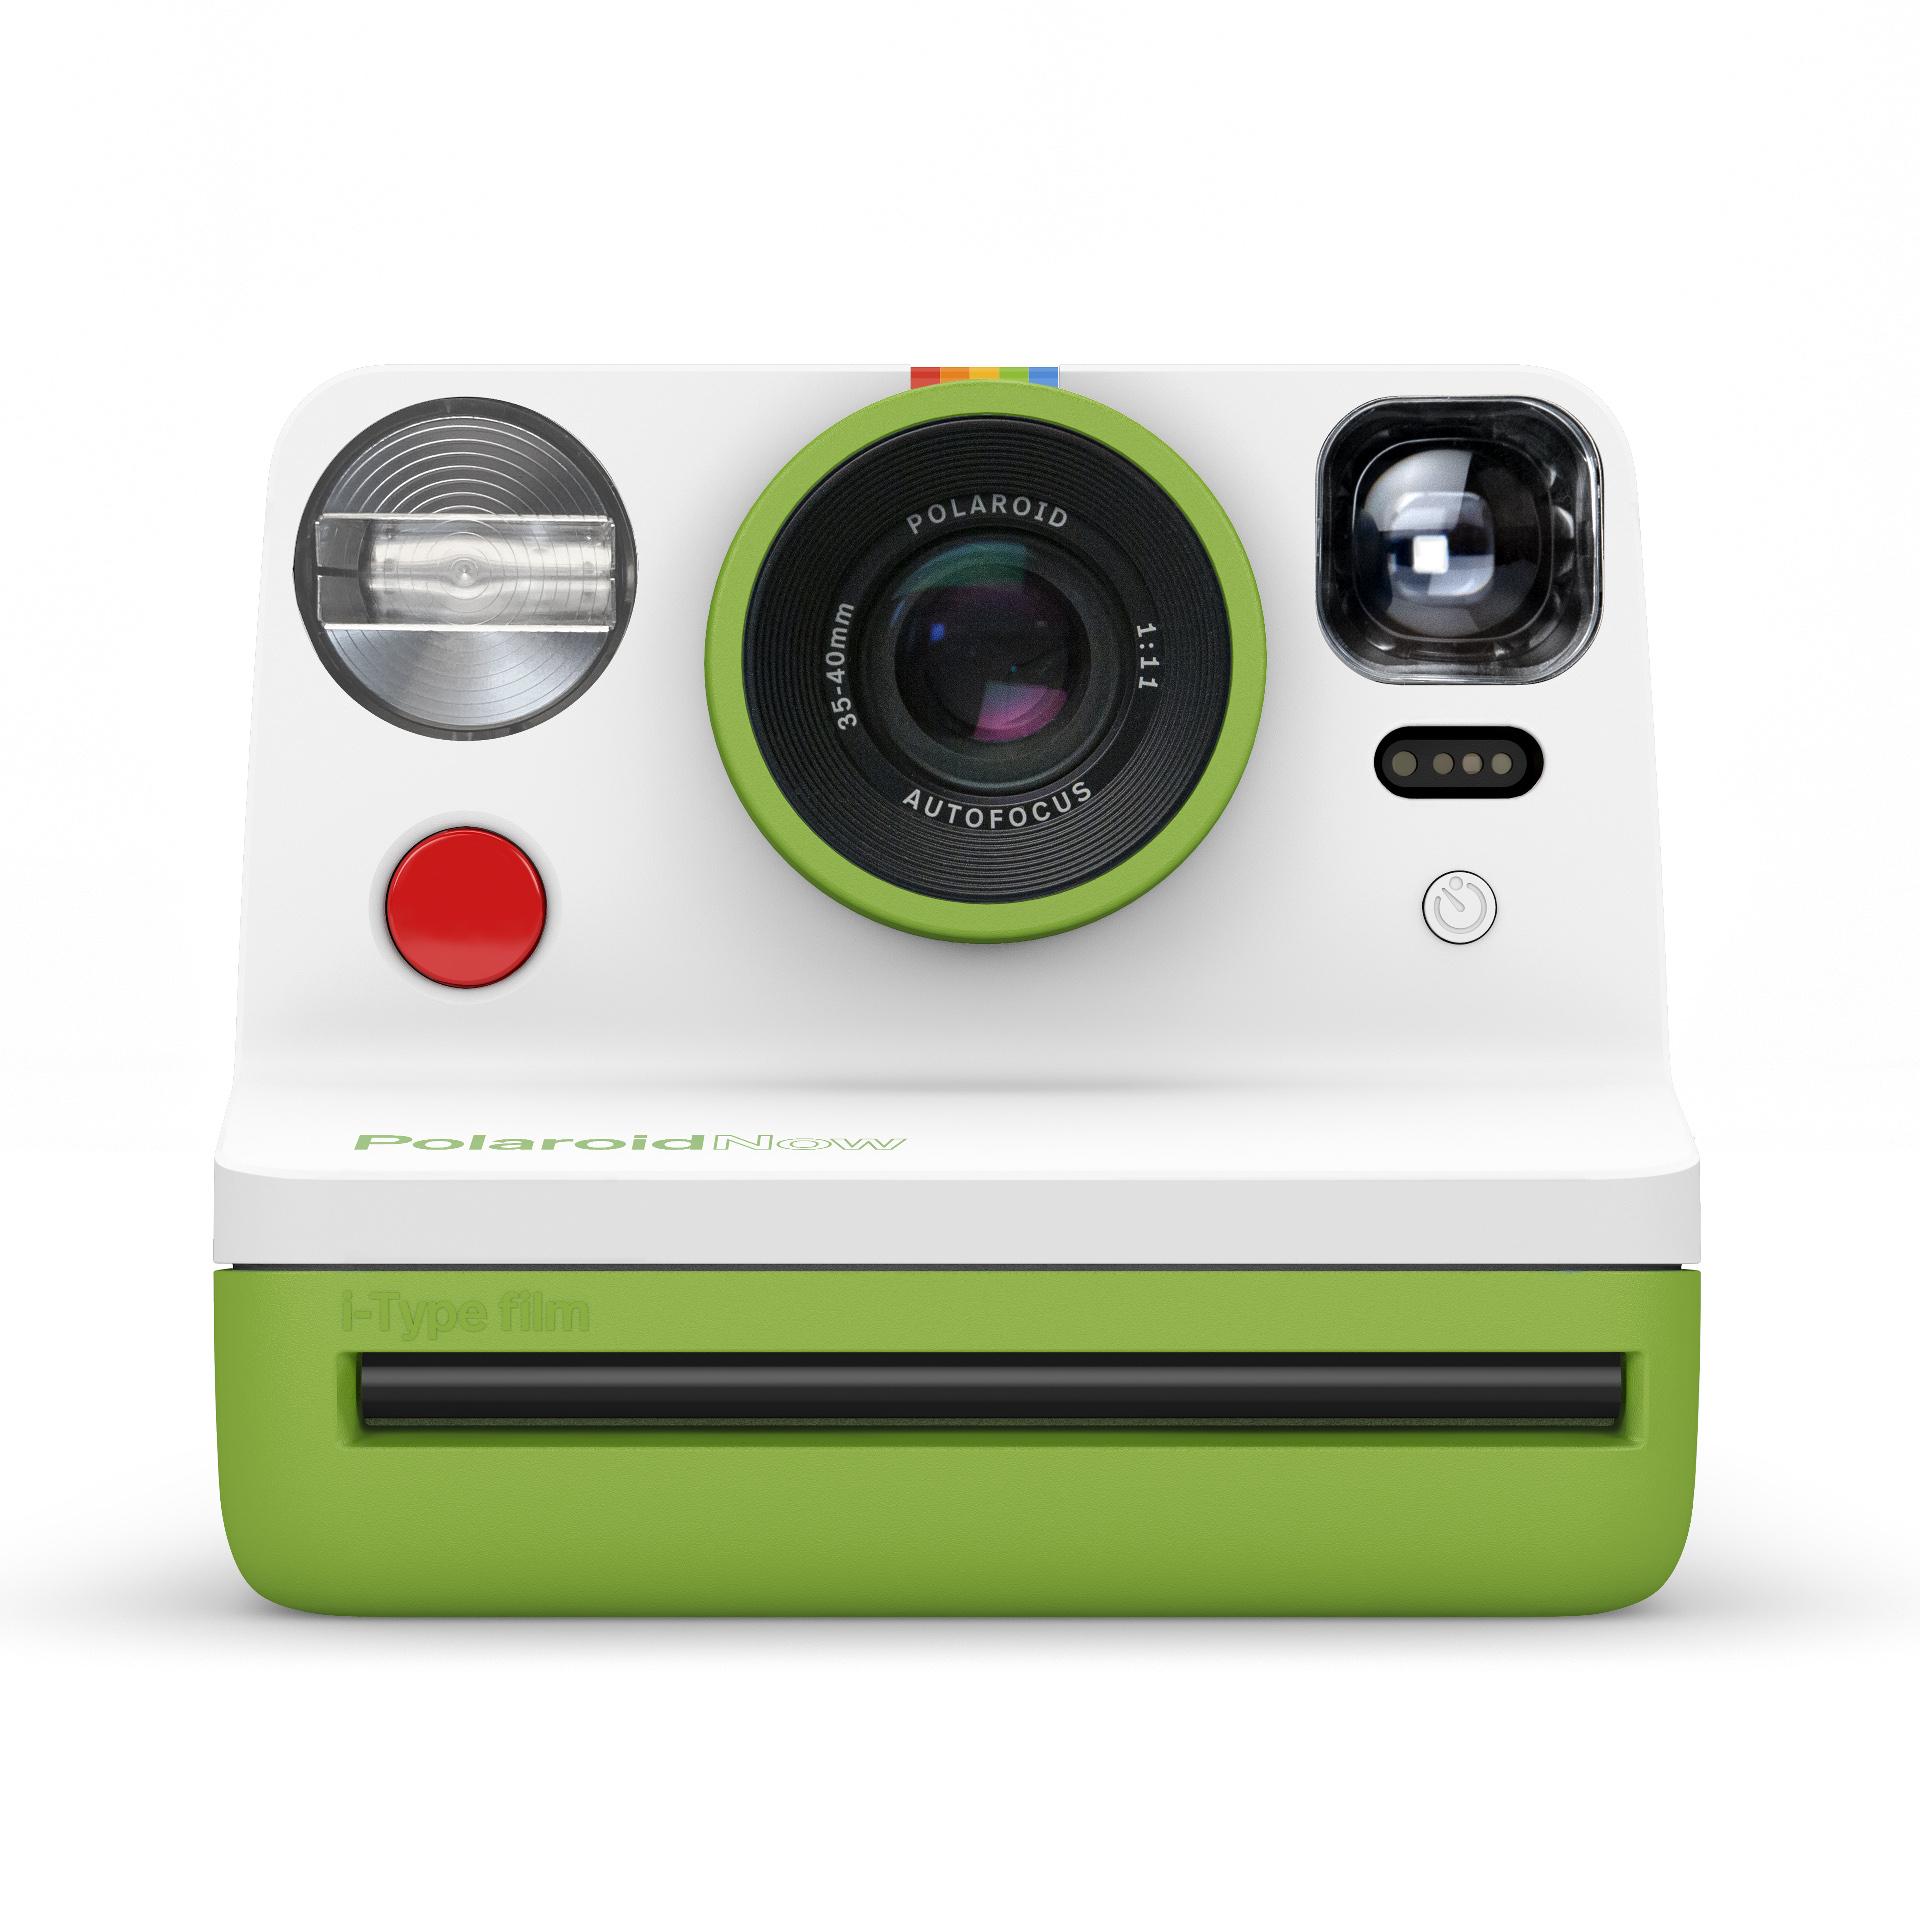 https://www.karacasulu.com/wp-content/uploads/2020/10/PolaroidNow-GREEN_FRONT-TRr.jpg